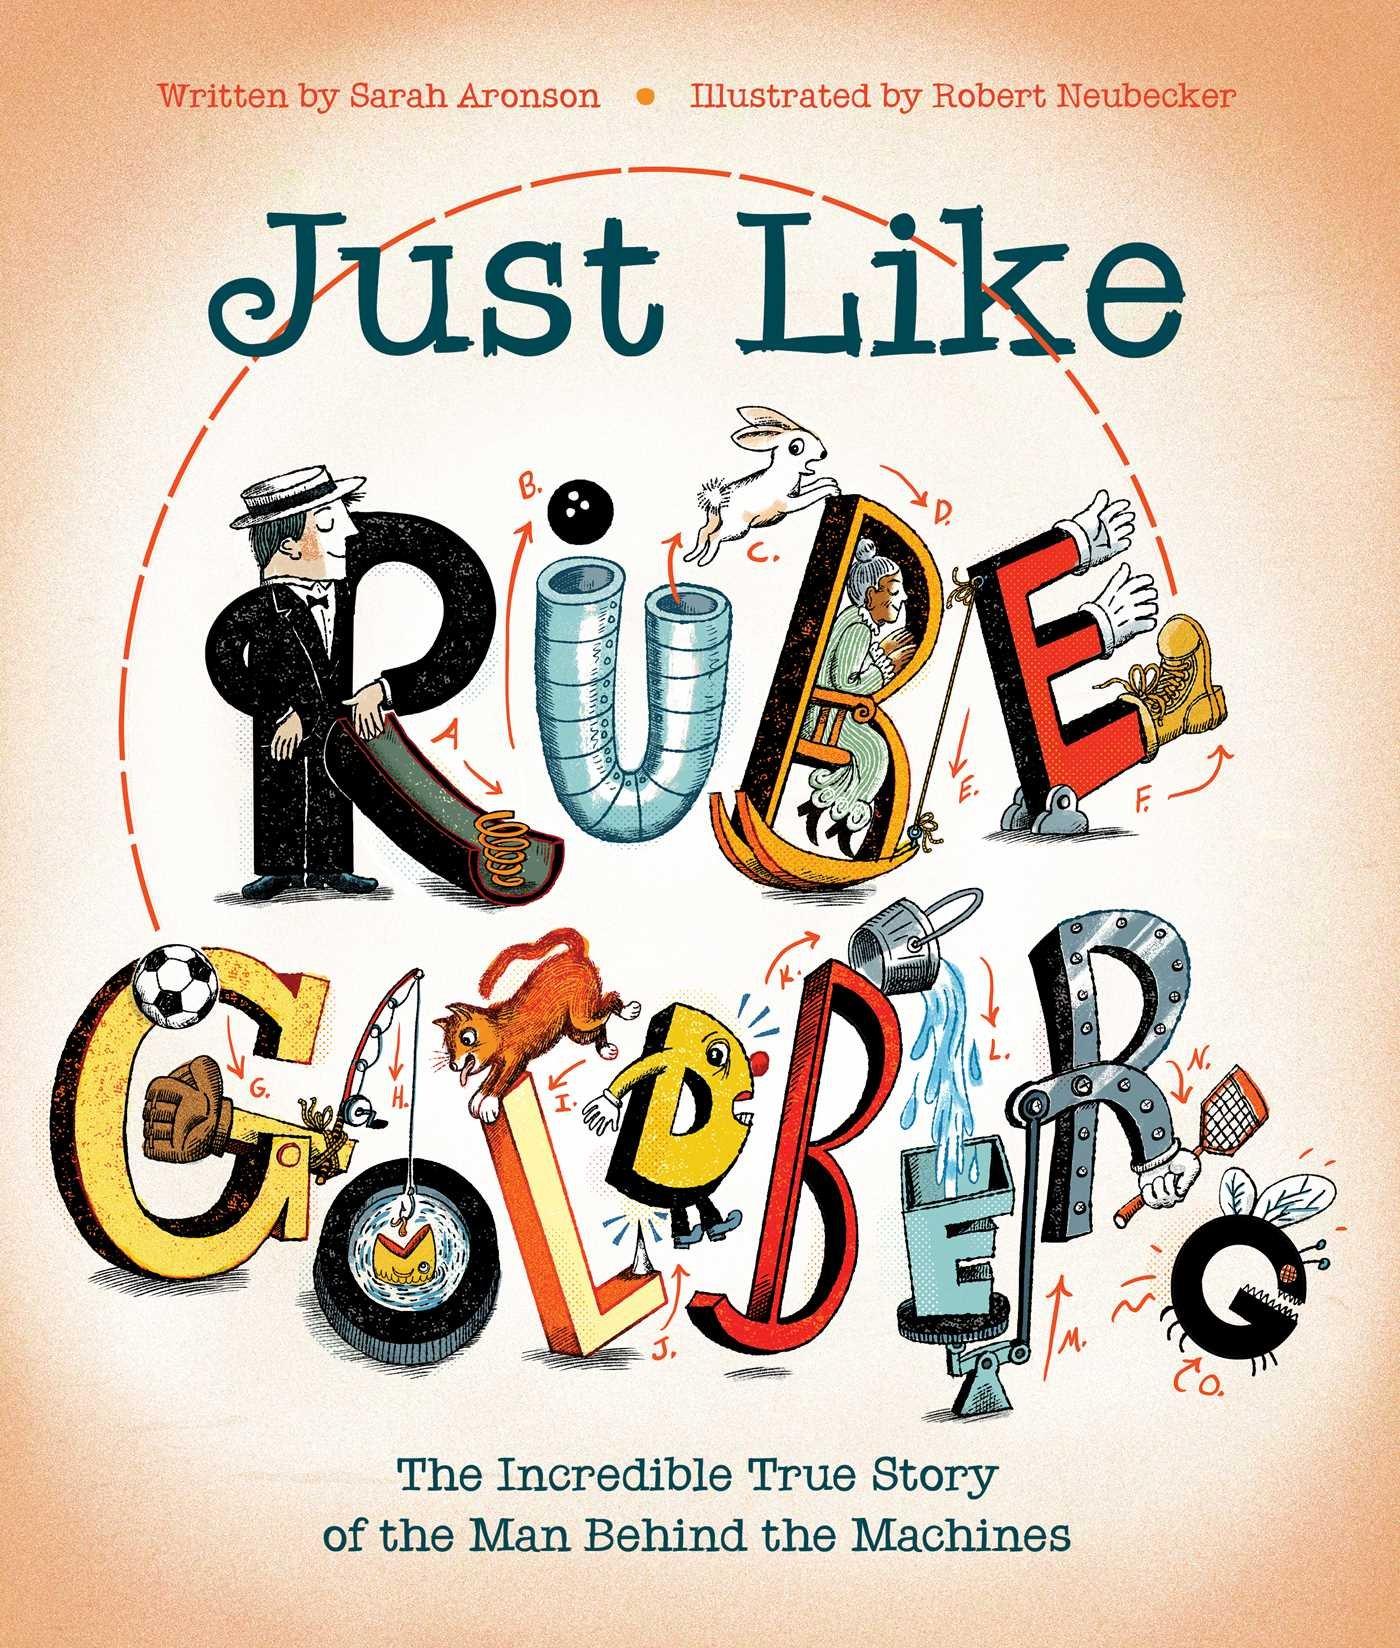 Just Like Rube Goldberg by Sarah Aronson